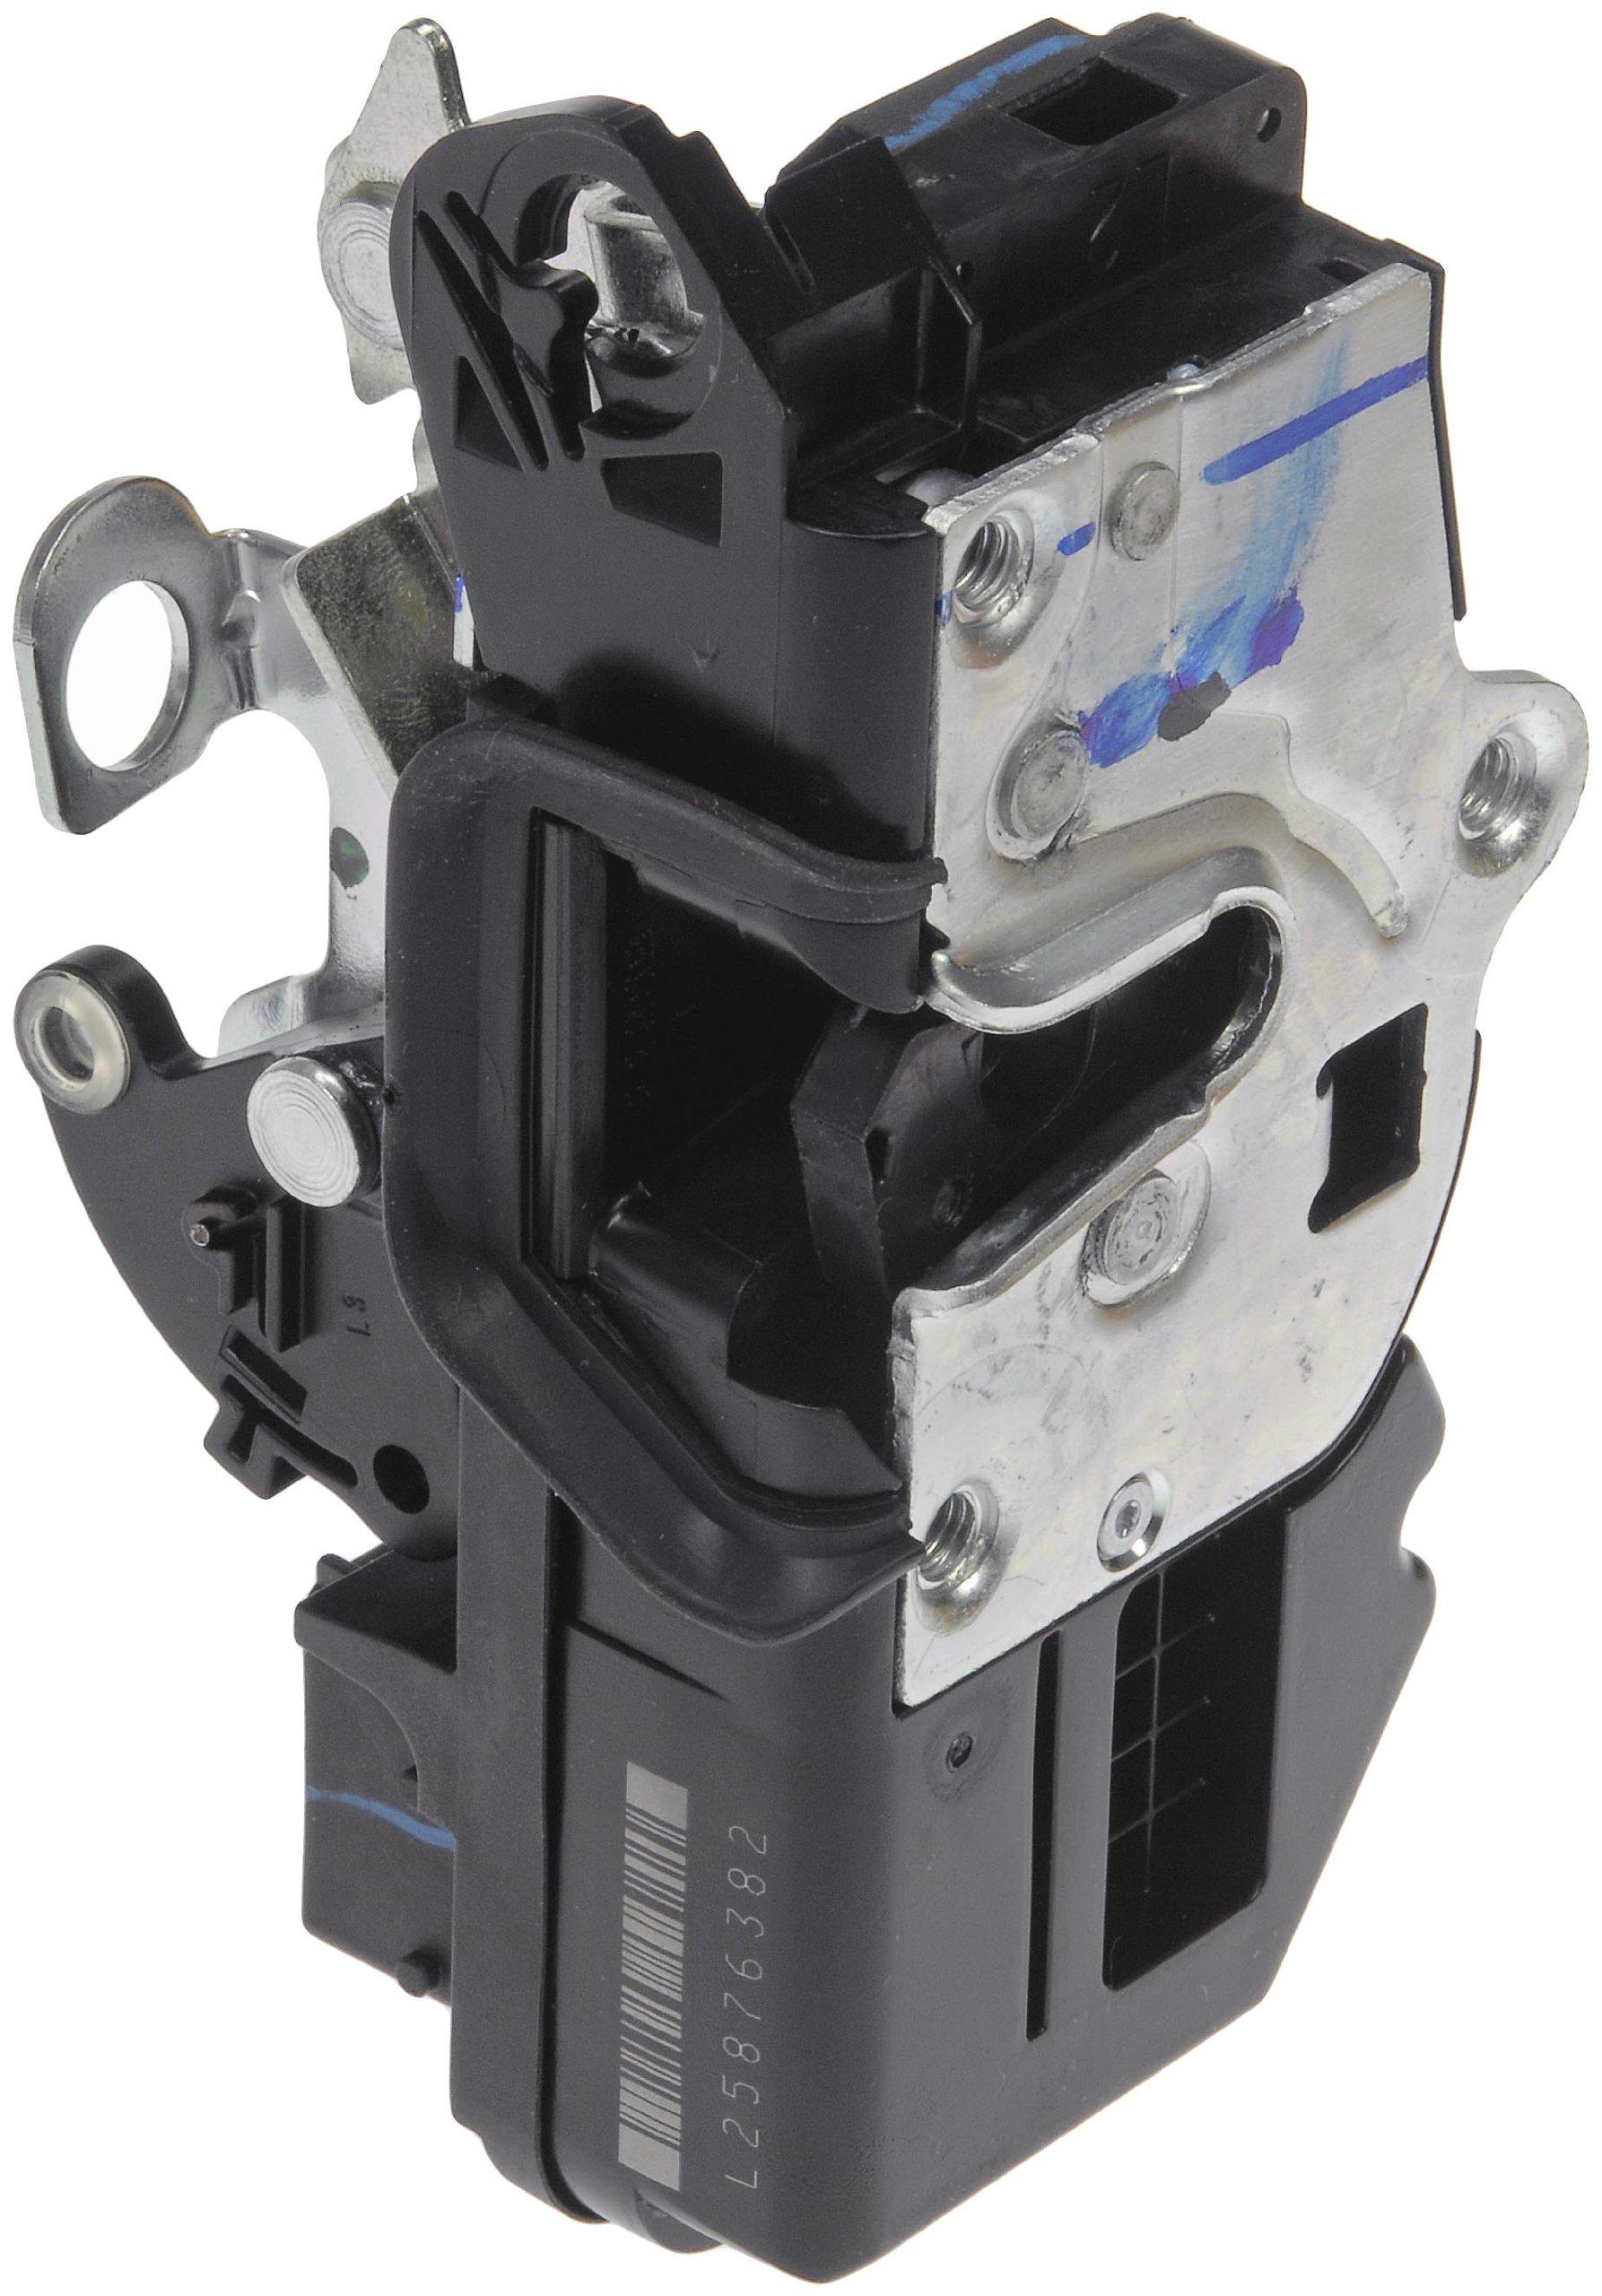 Dorman 931-303 Front Drivers Side Door Lock Actuator Motor for Select Chevrolet/GMC / Cadillac Trucks